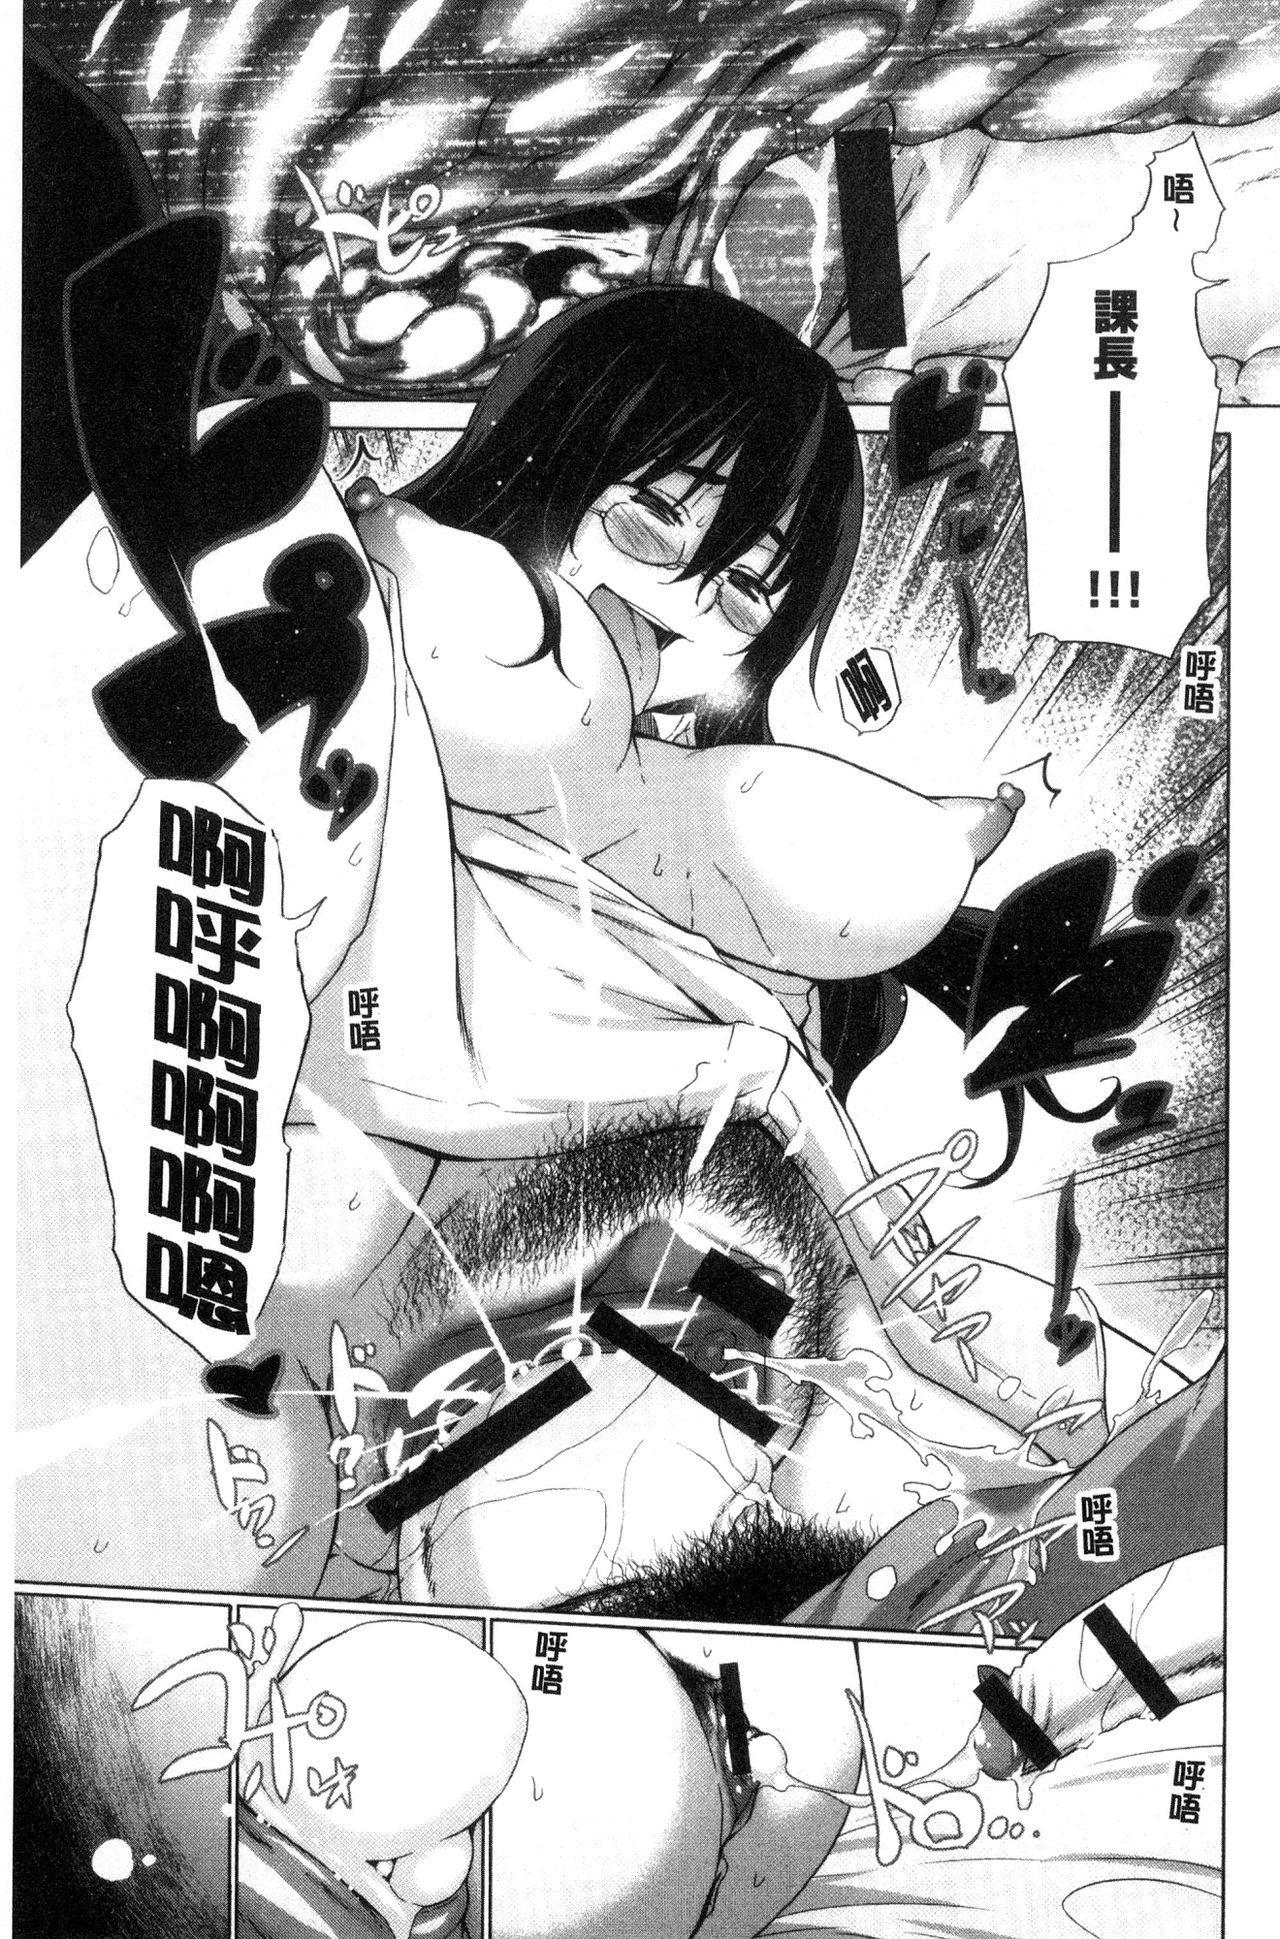 [Miyano Kintarou] Hishoujo List - The Non-Virgin List  | 非處女的名單 [Chinese] 168